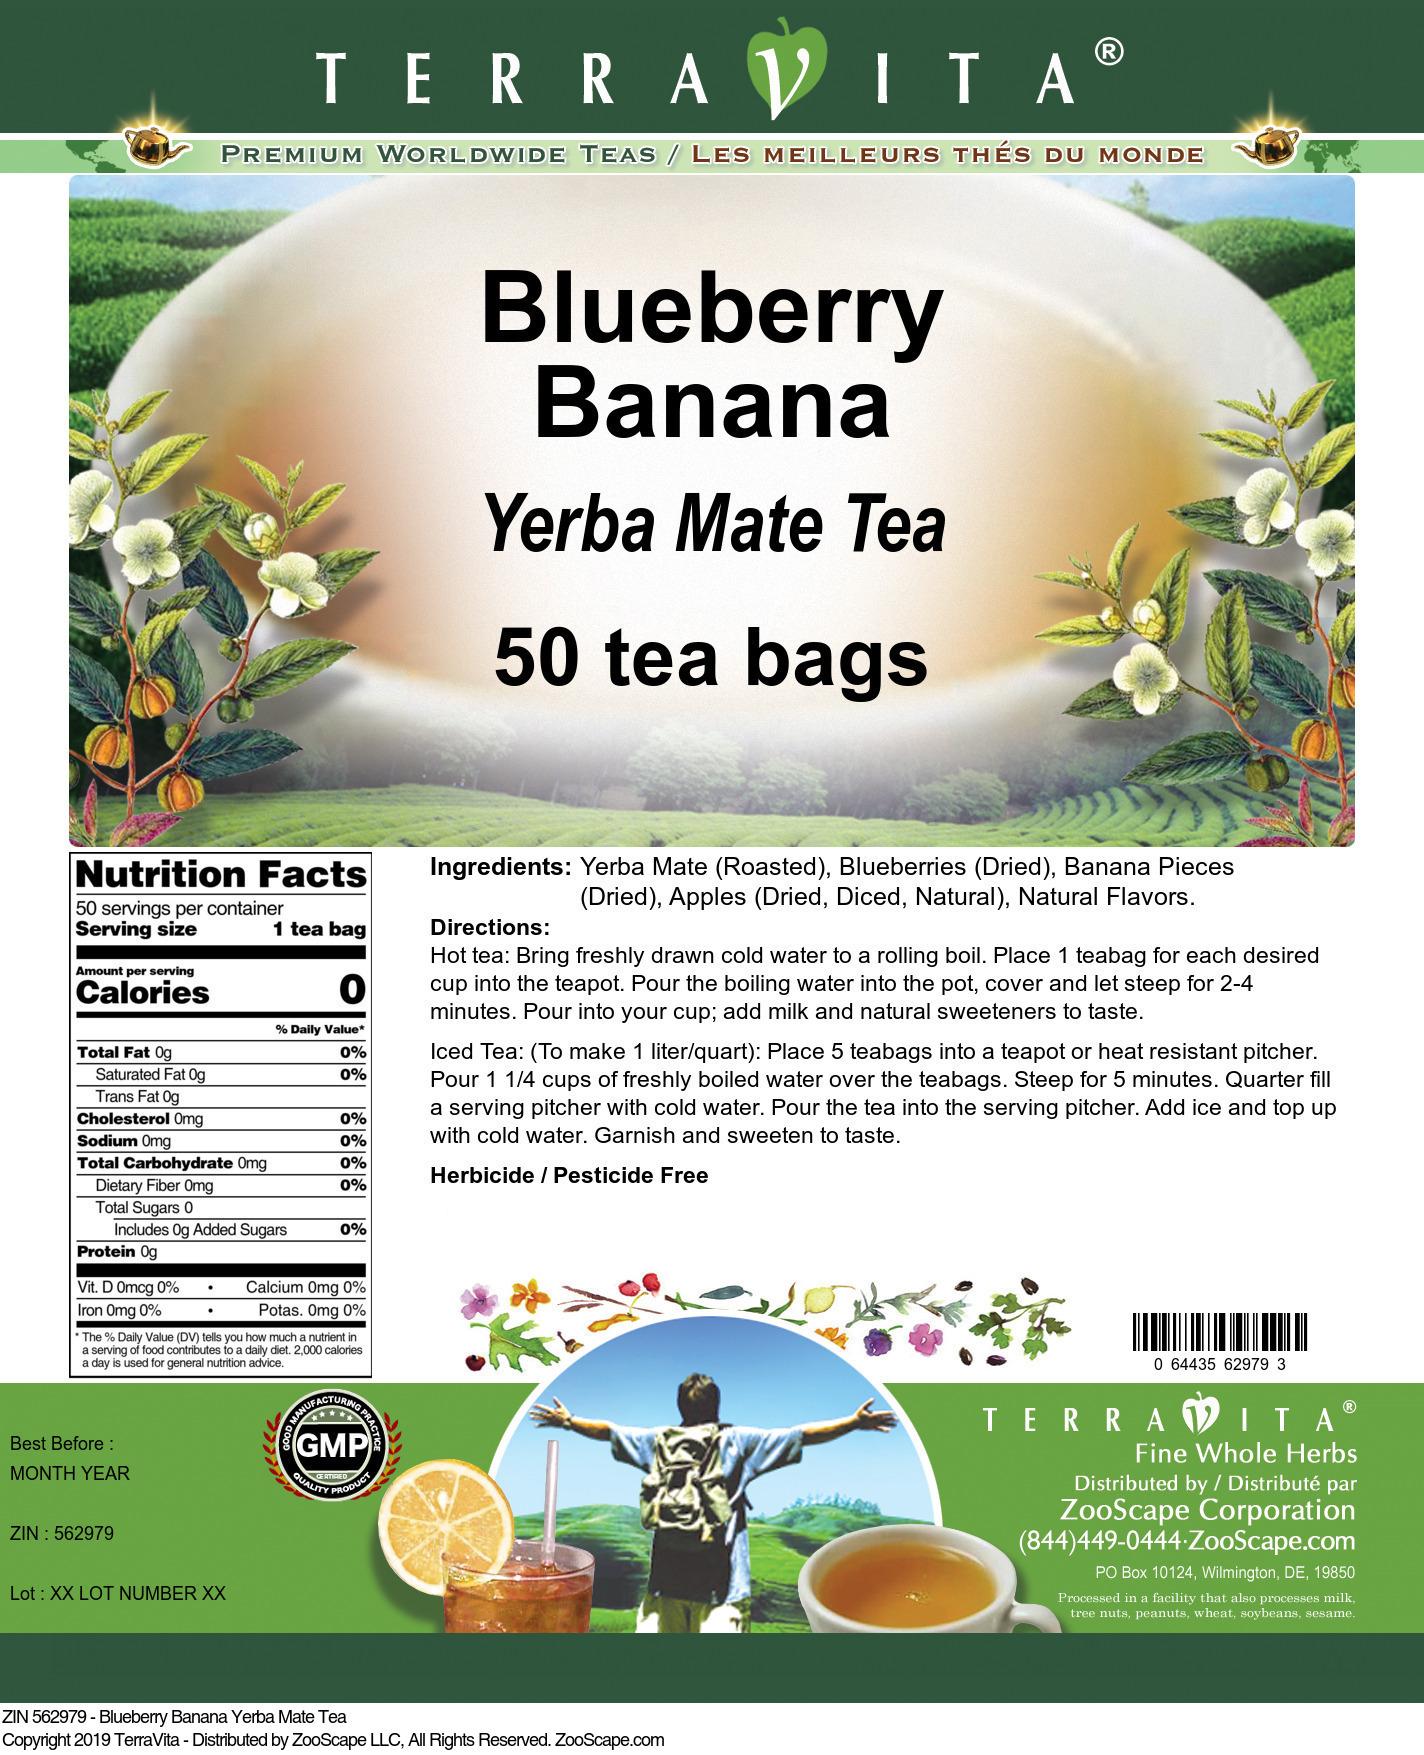 Blueberry Banana Yerba Mate Tea